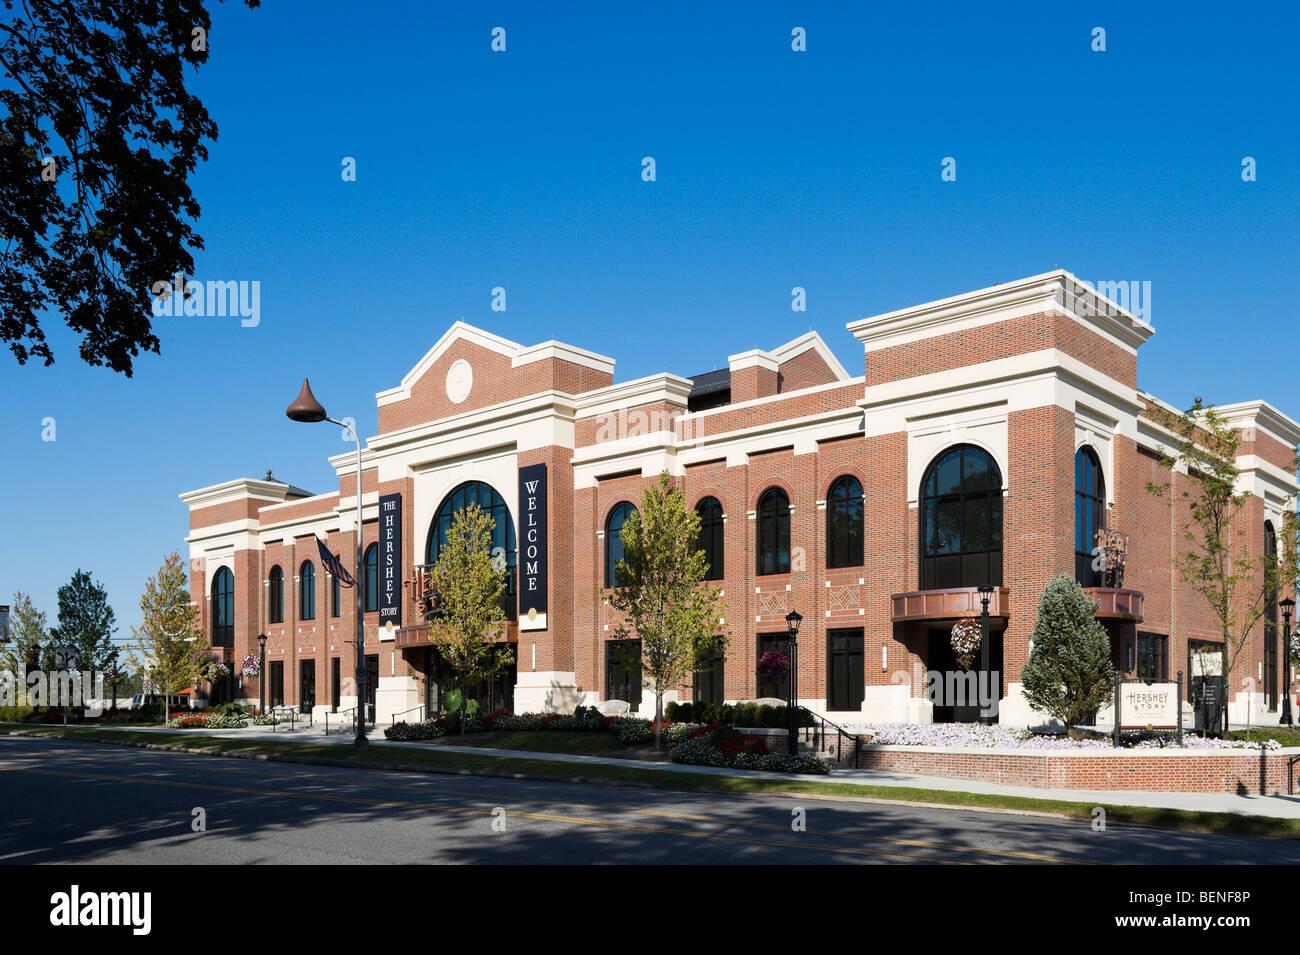 The Hershey Story Museum on Chocolate Avenue, Hershey, Pennsylvania, USA - Stock Image